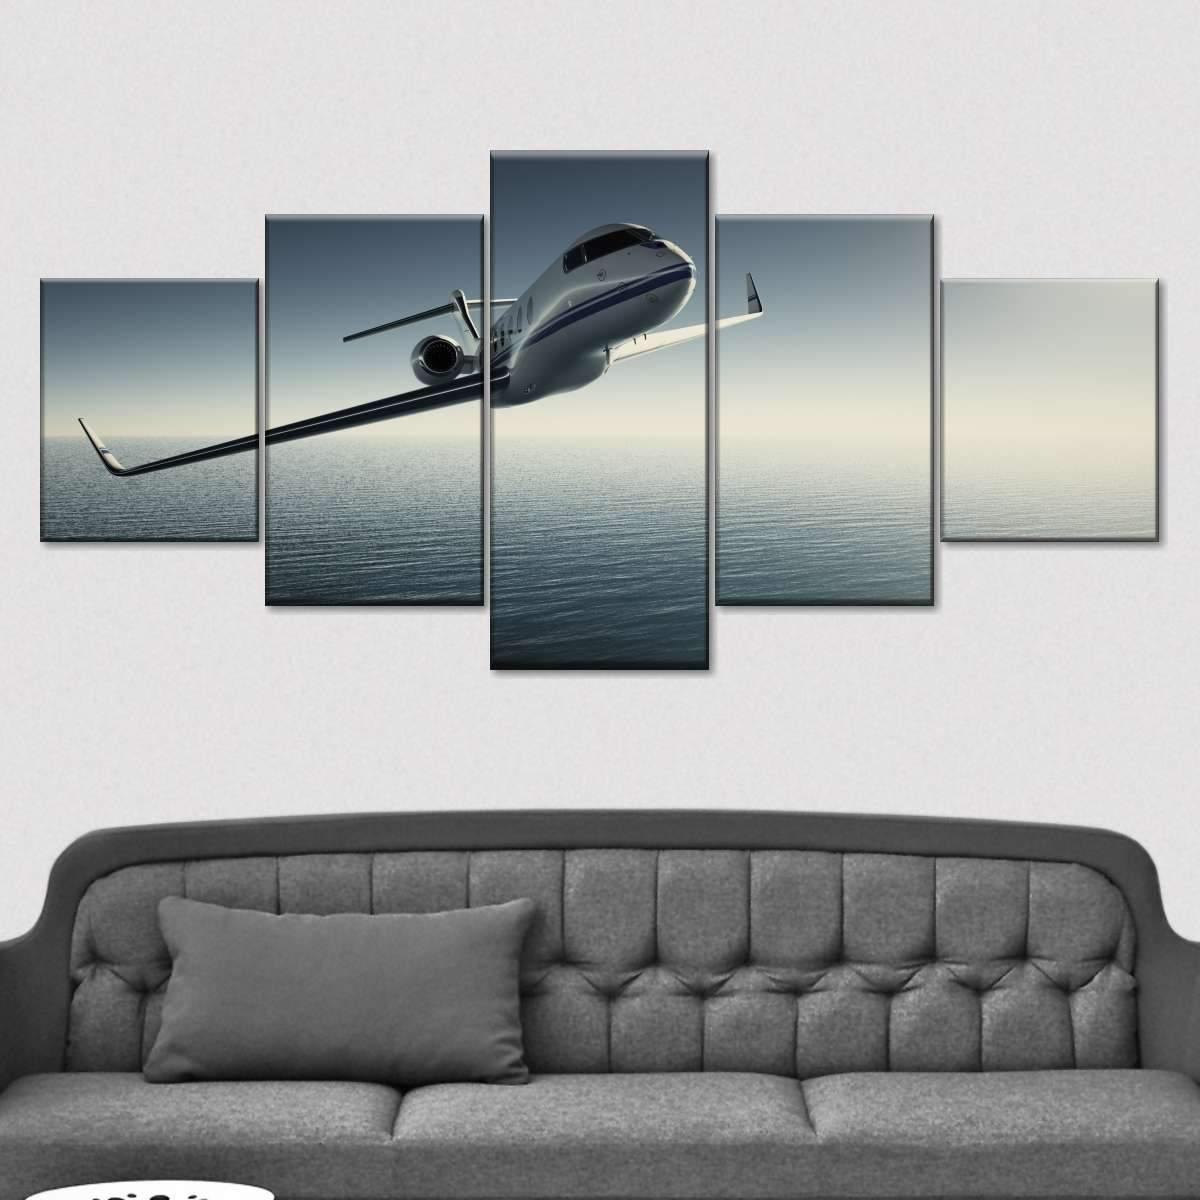 Private Jet Multi Panel Canvas Wall Art